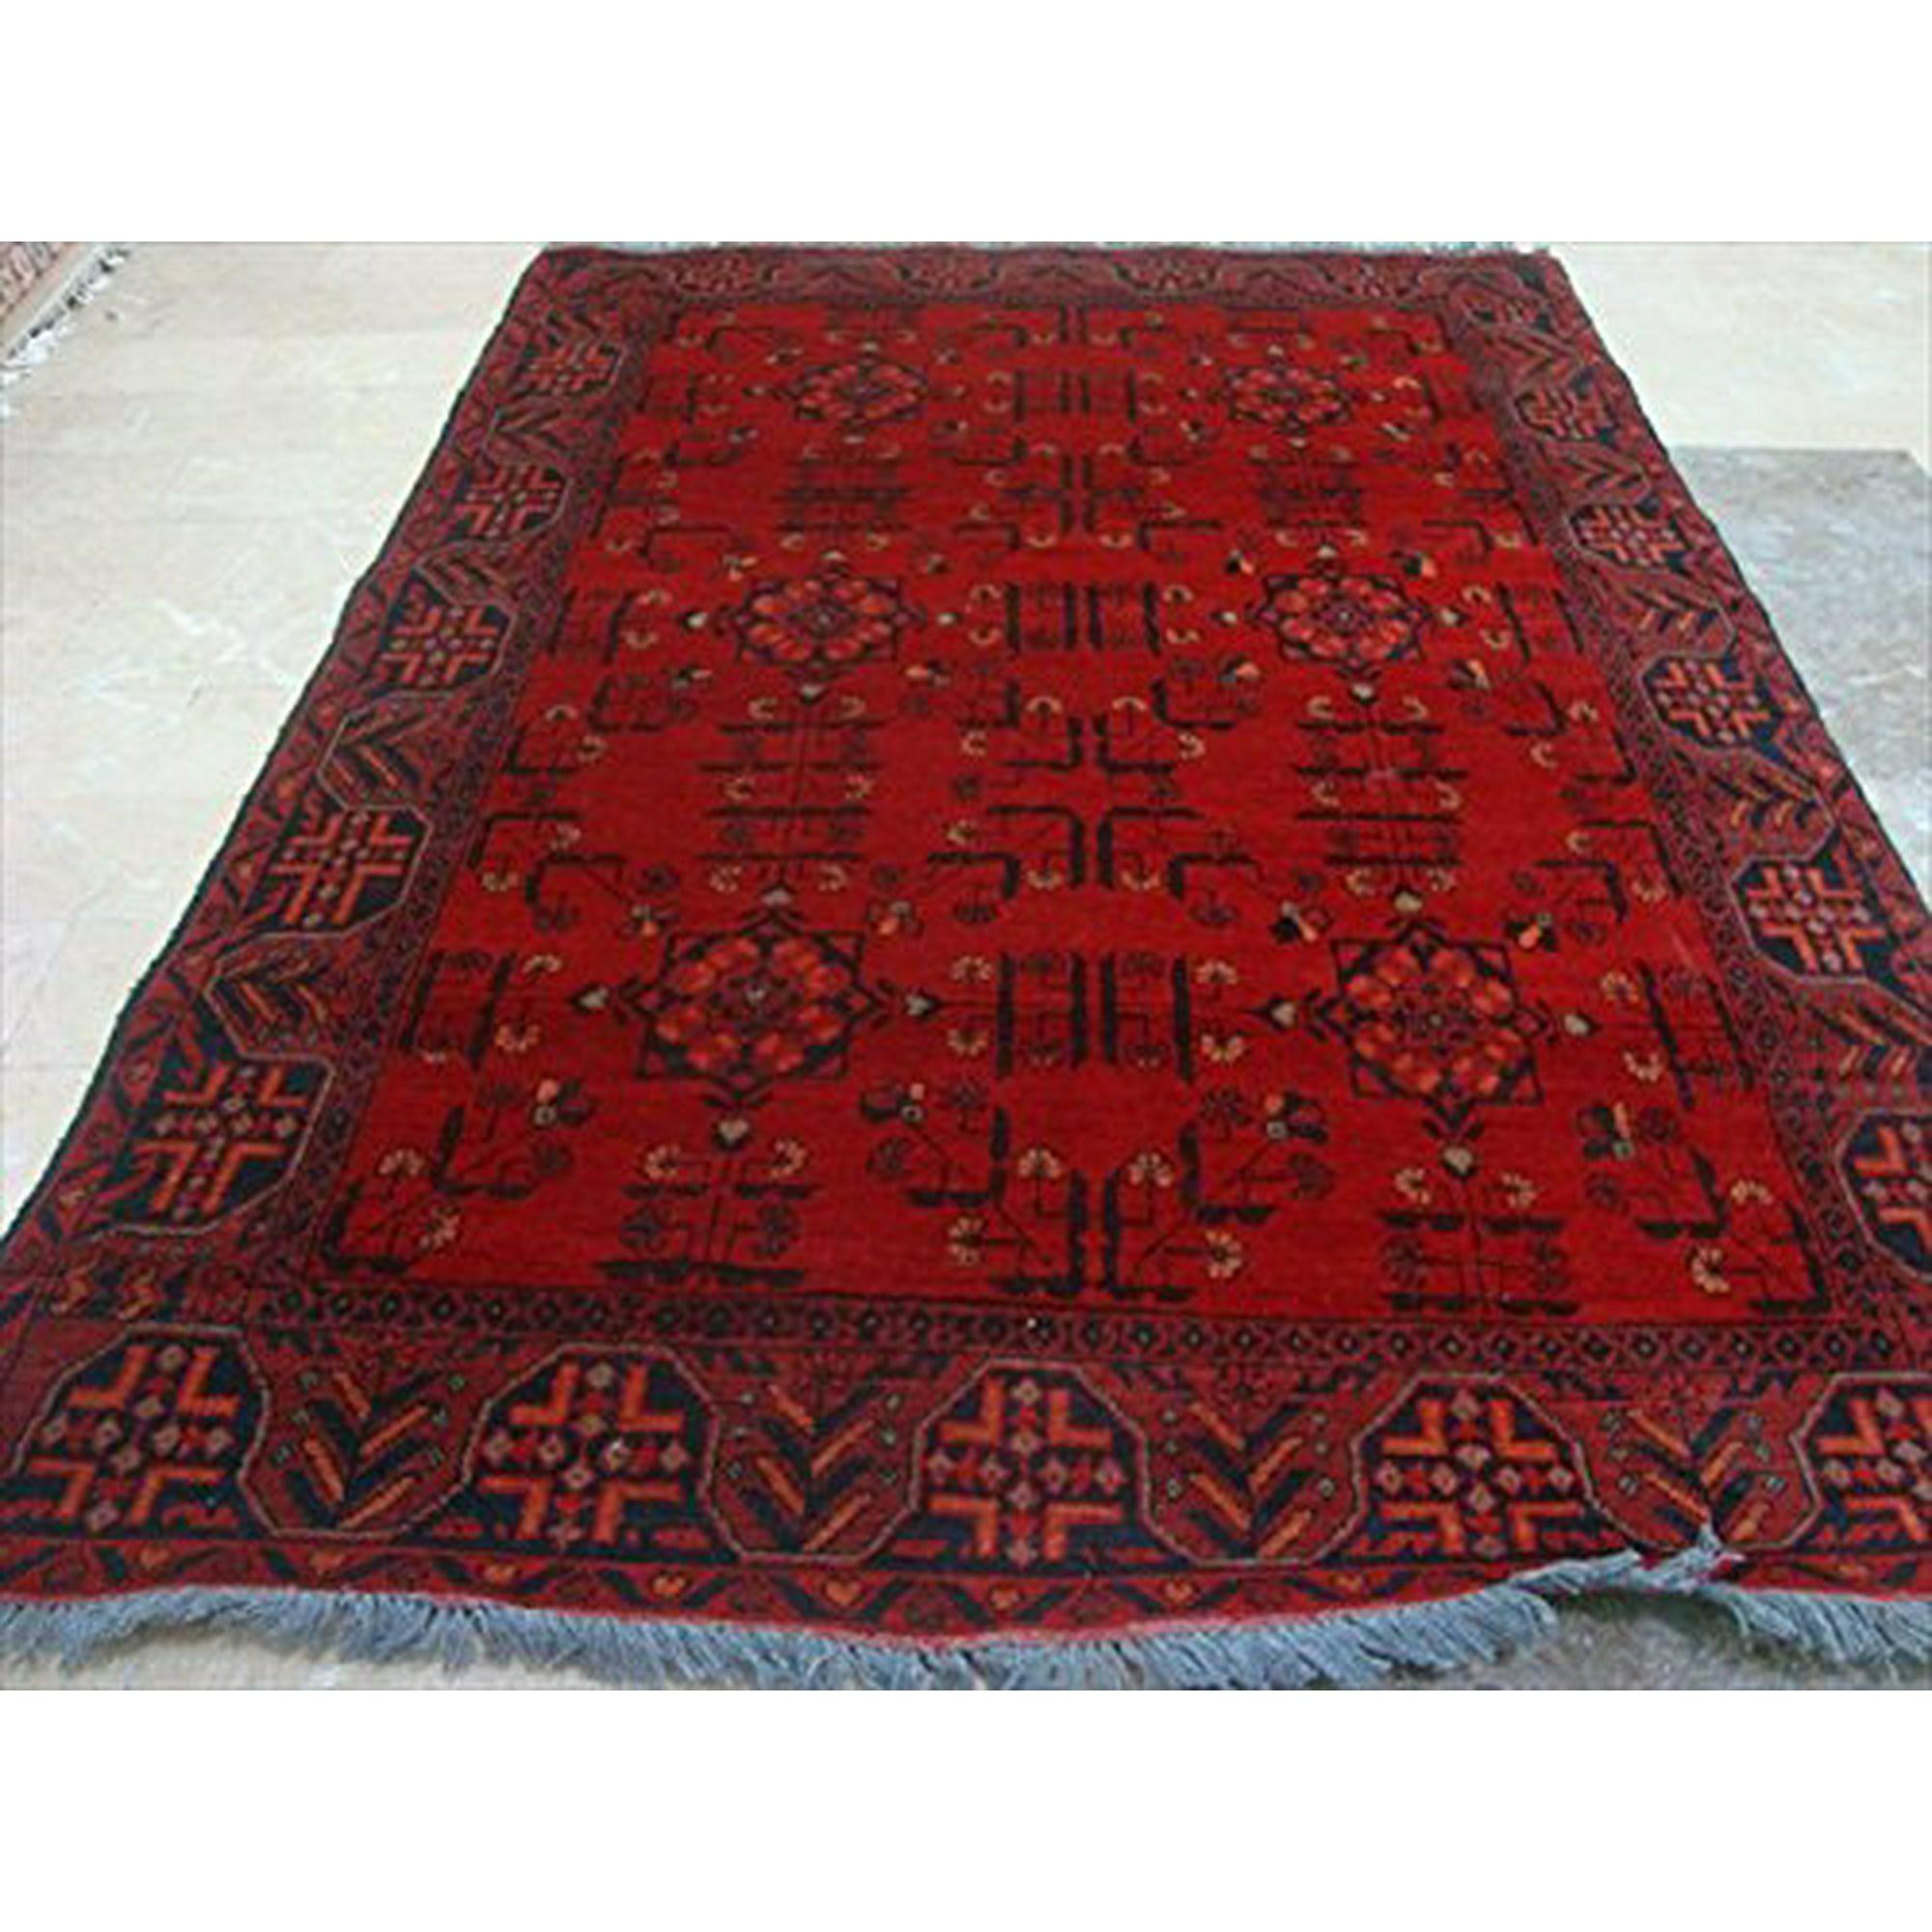 Ahmedani Exclusive Khal Muhamadi Fine Afghan Hand Knotted Rectangle Area Rug Wool Carpet 6 1 X 4 3 Walmart Canada